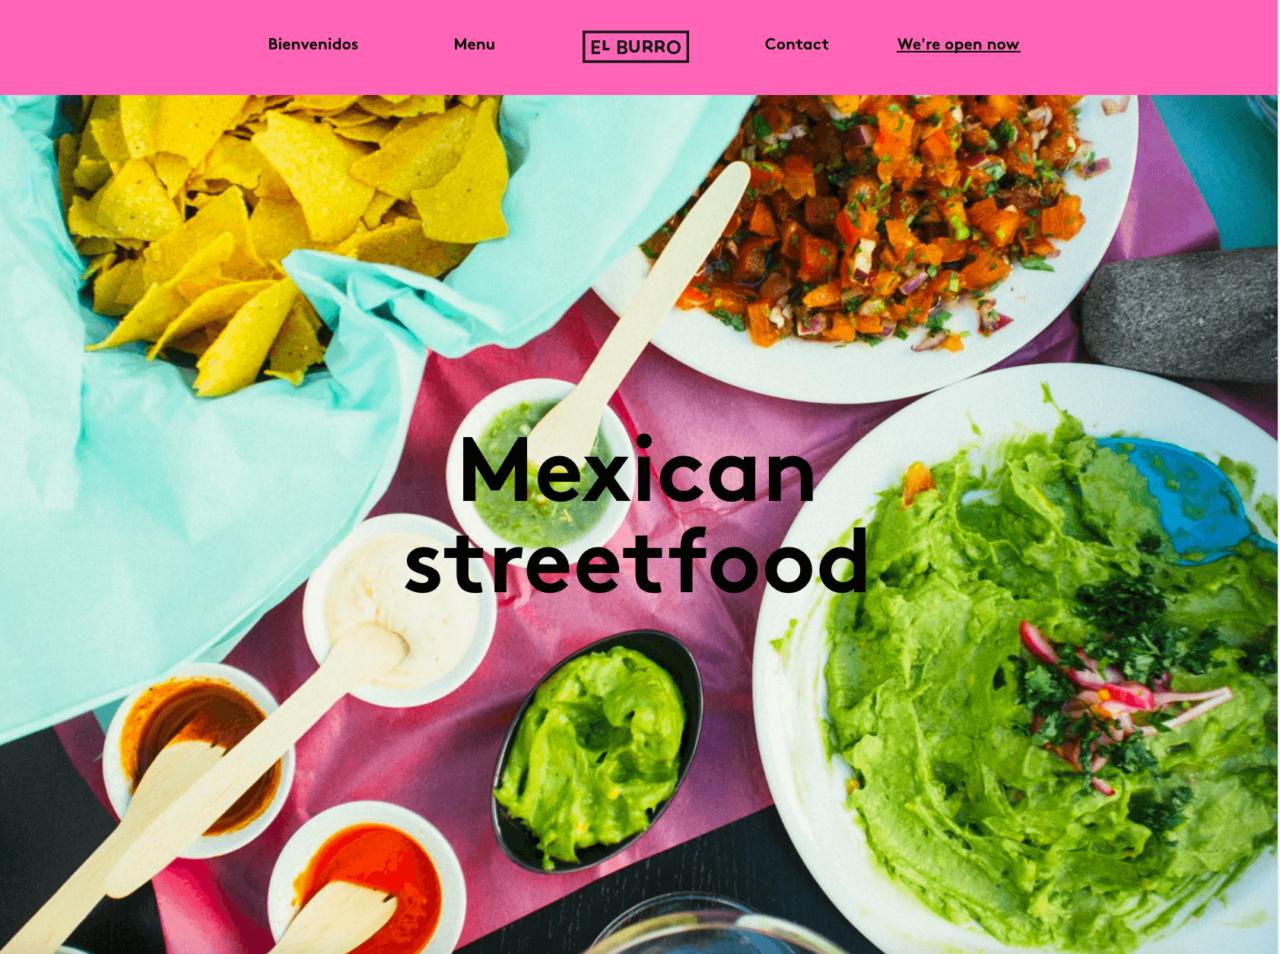 Design Website El burro Menu Restaurant geöffnet